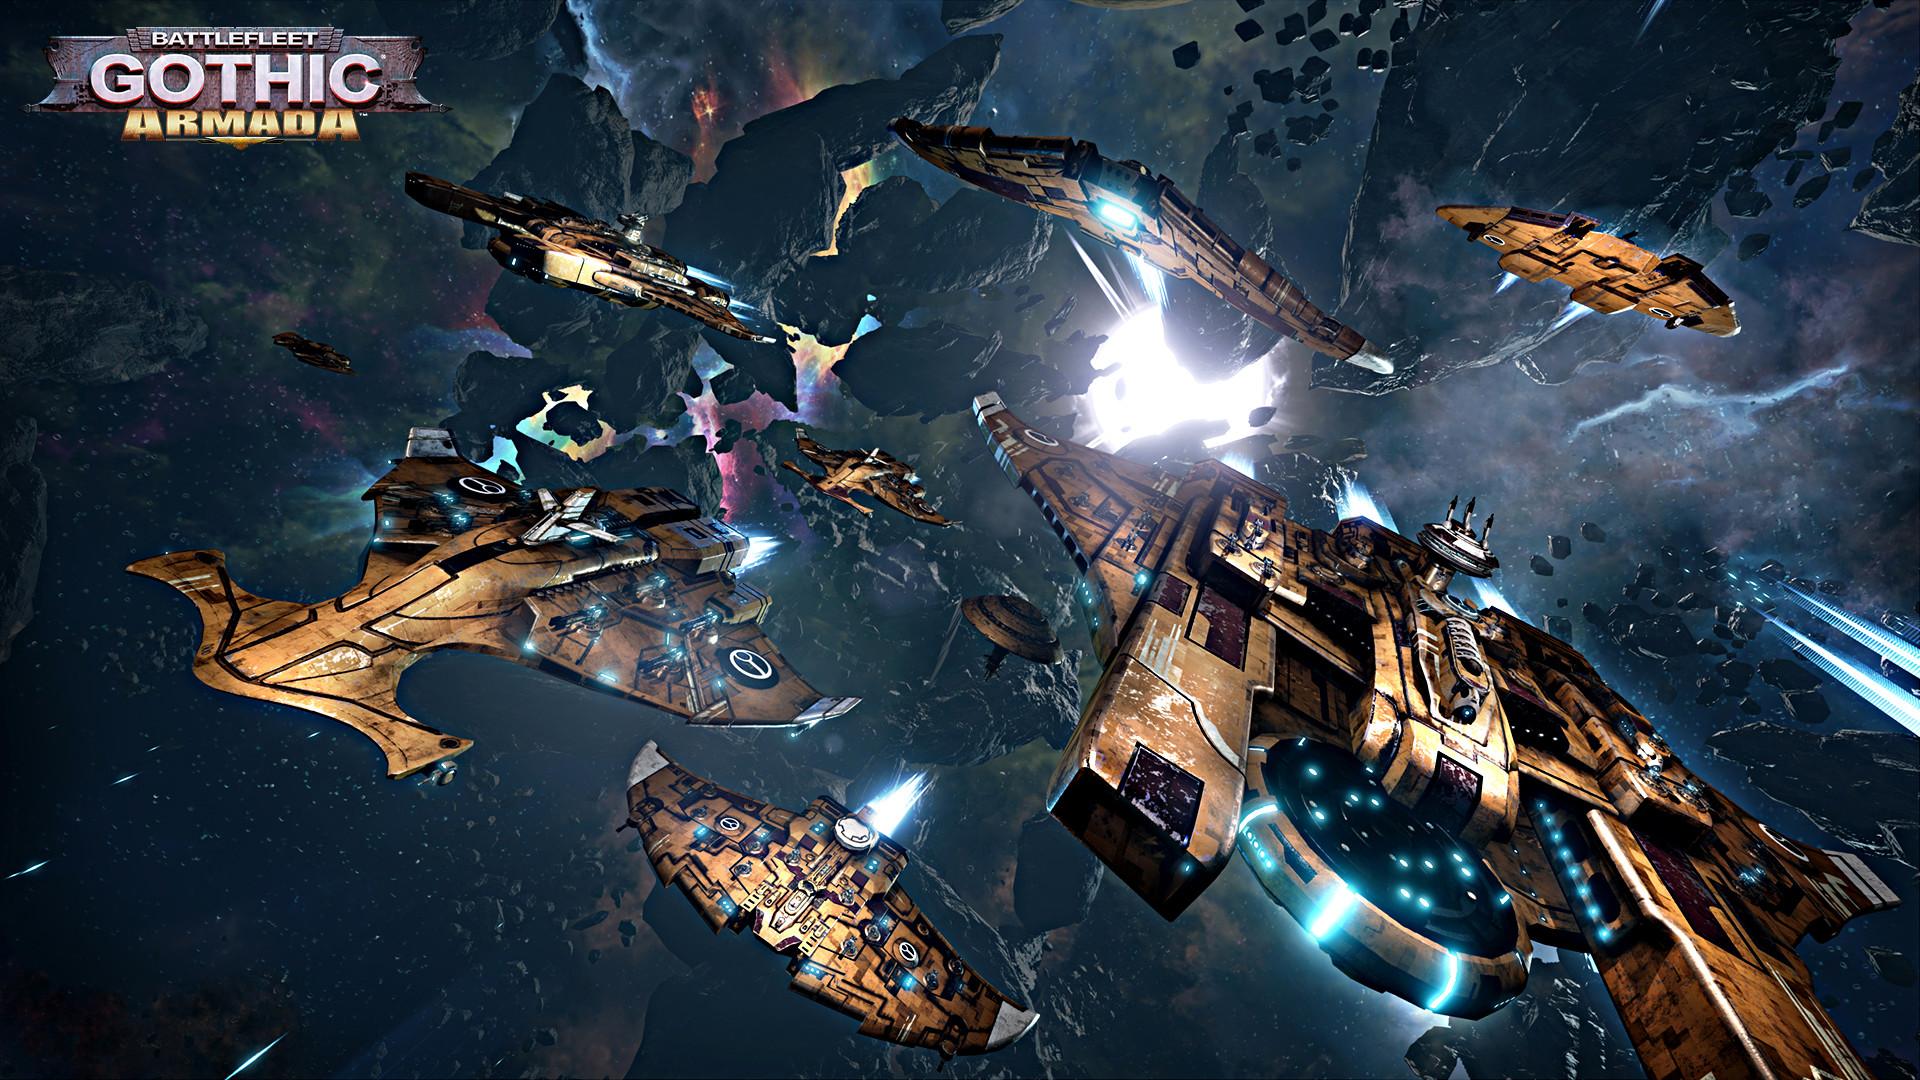 77 best battlefleet gothic, x wing miniatures, dropfleet, images on  Pinterest | Wings, Warhammer 40k and Space marine